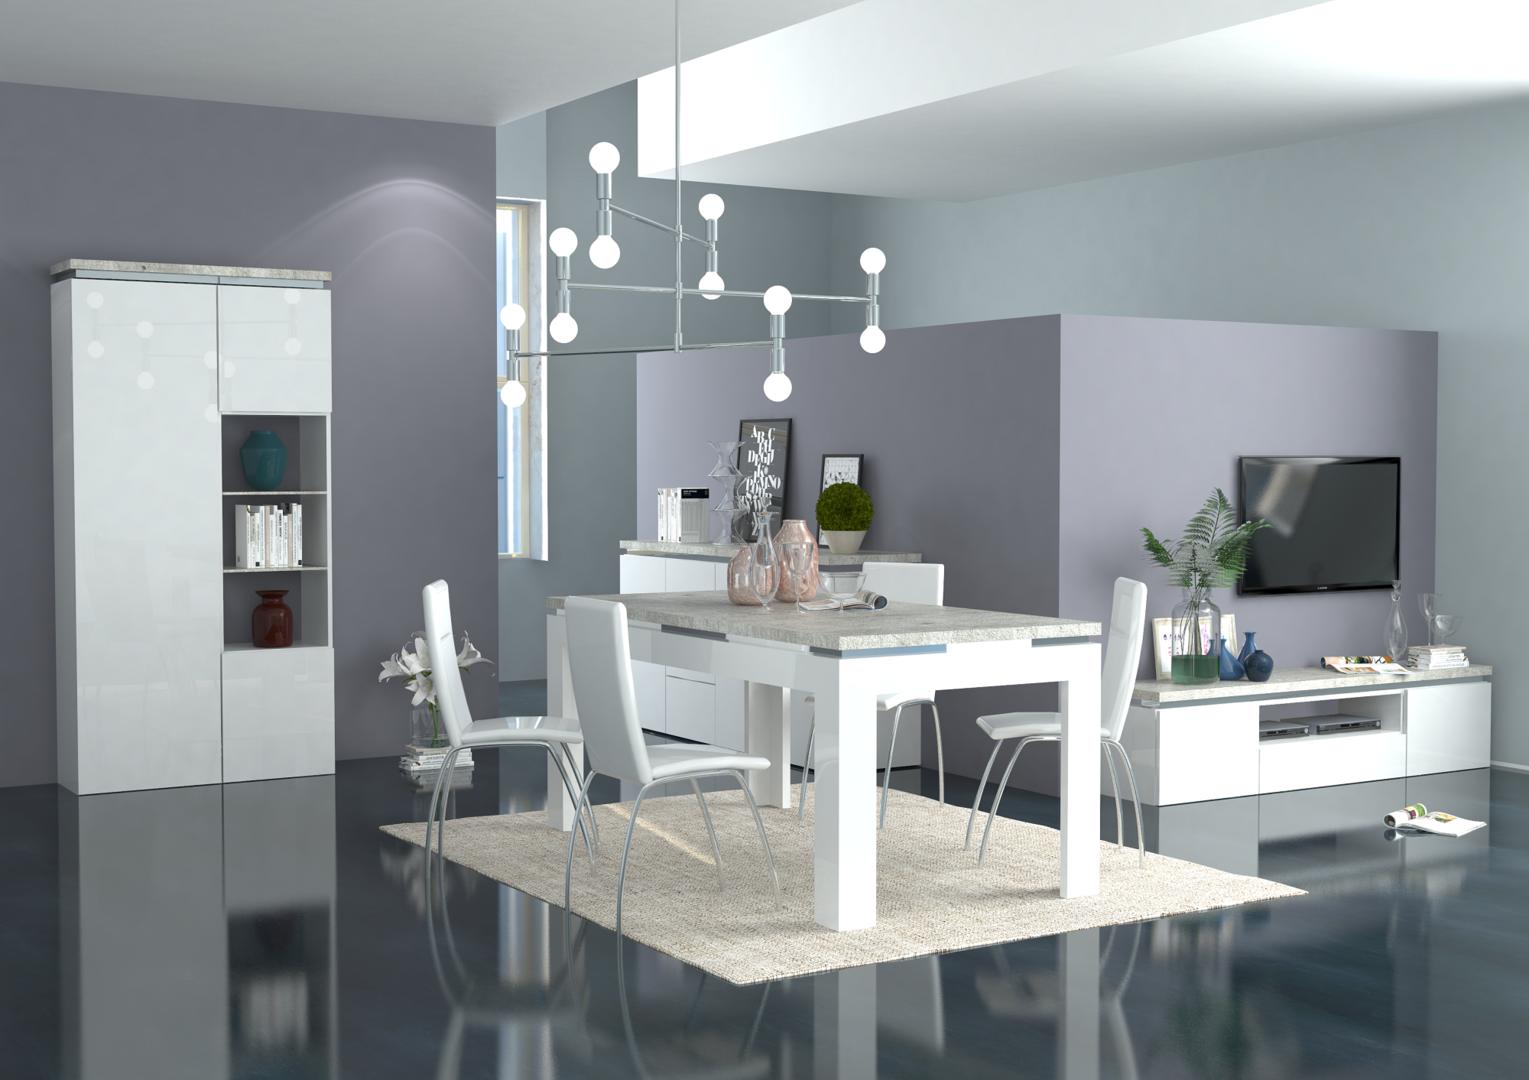 Tavolo moderno bianco messico mobile per sala da pranzo for Arredamento sala moderno